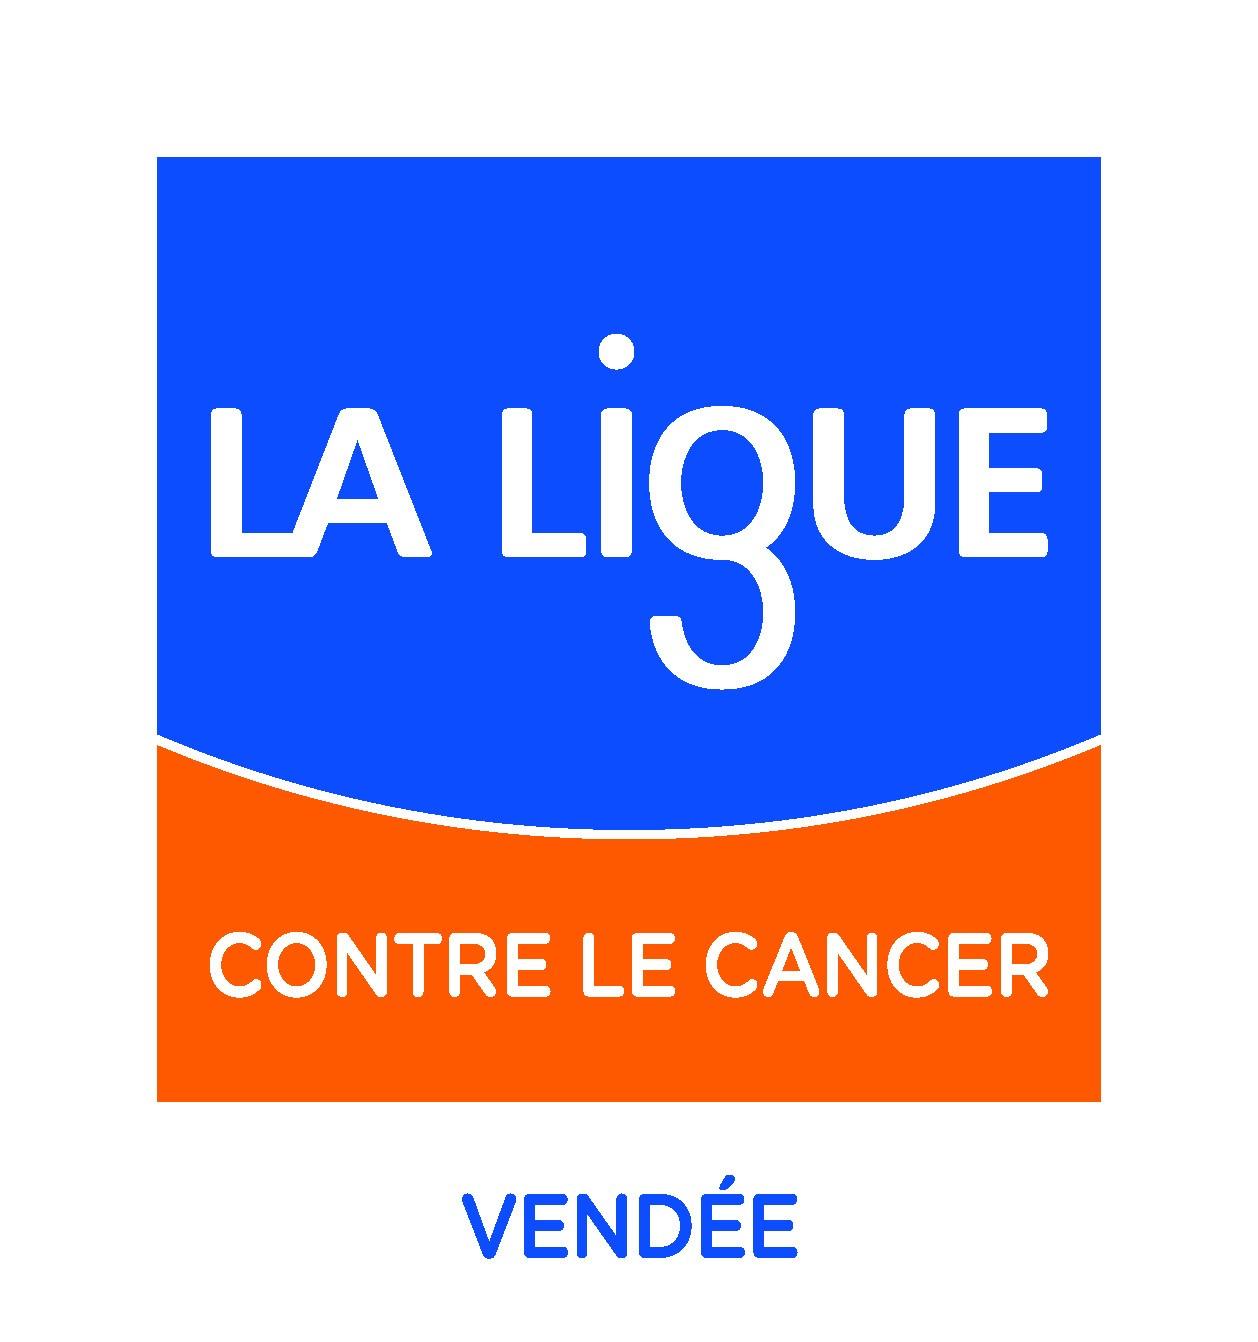 logo-comite-ligue-vendee-coul-186574